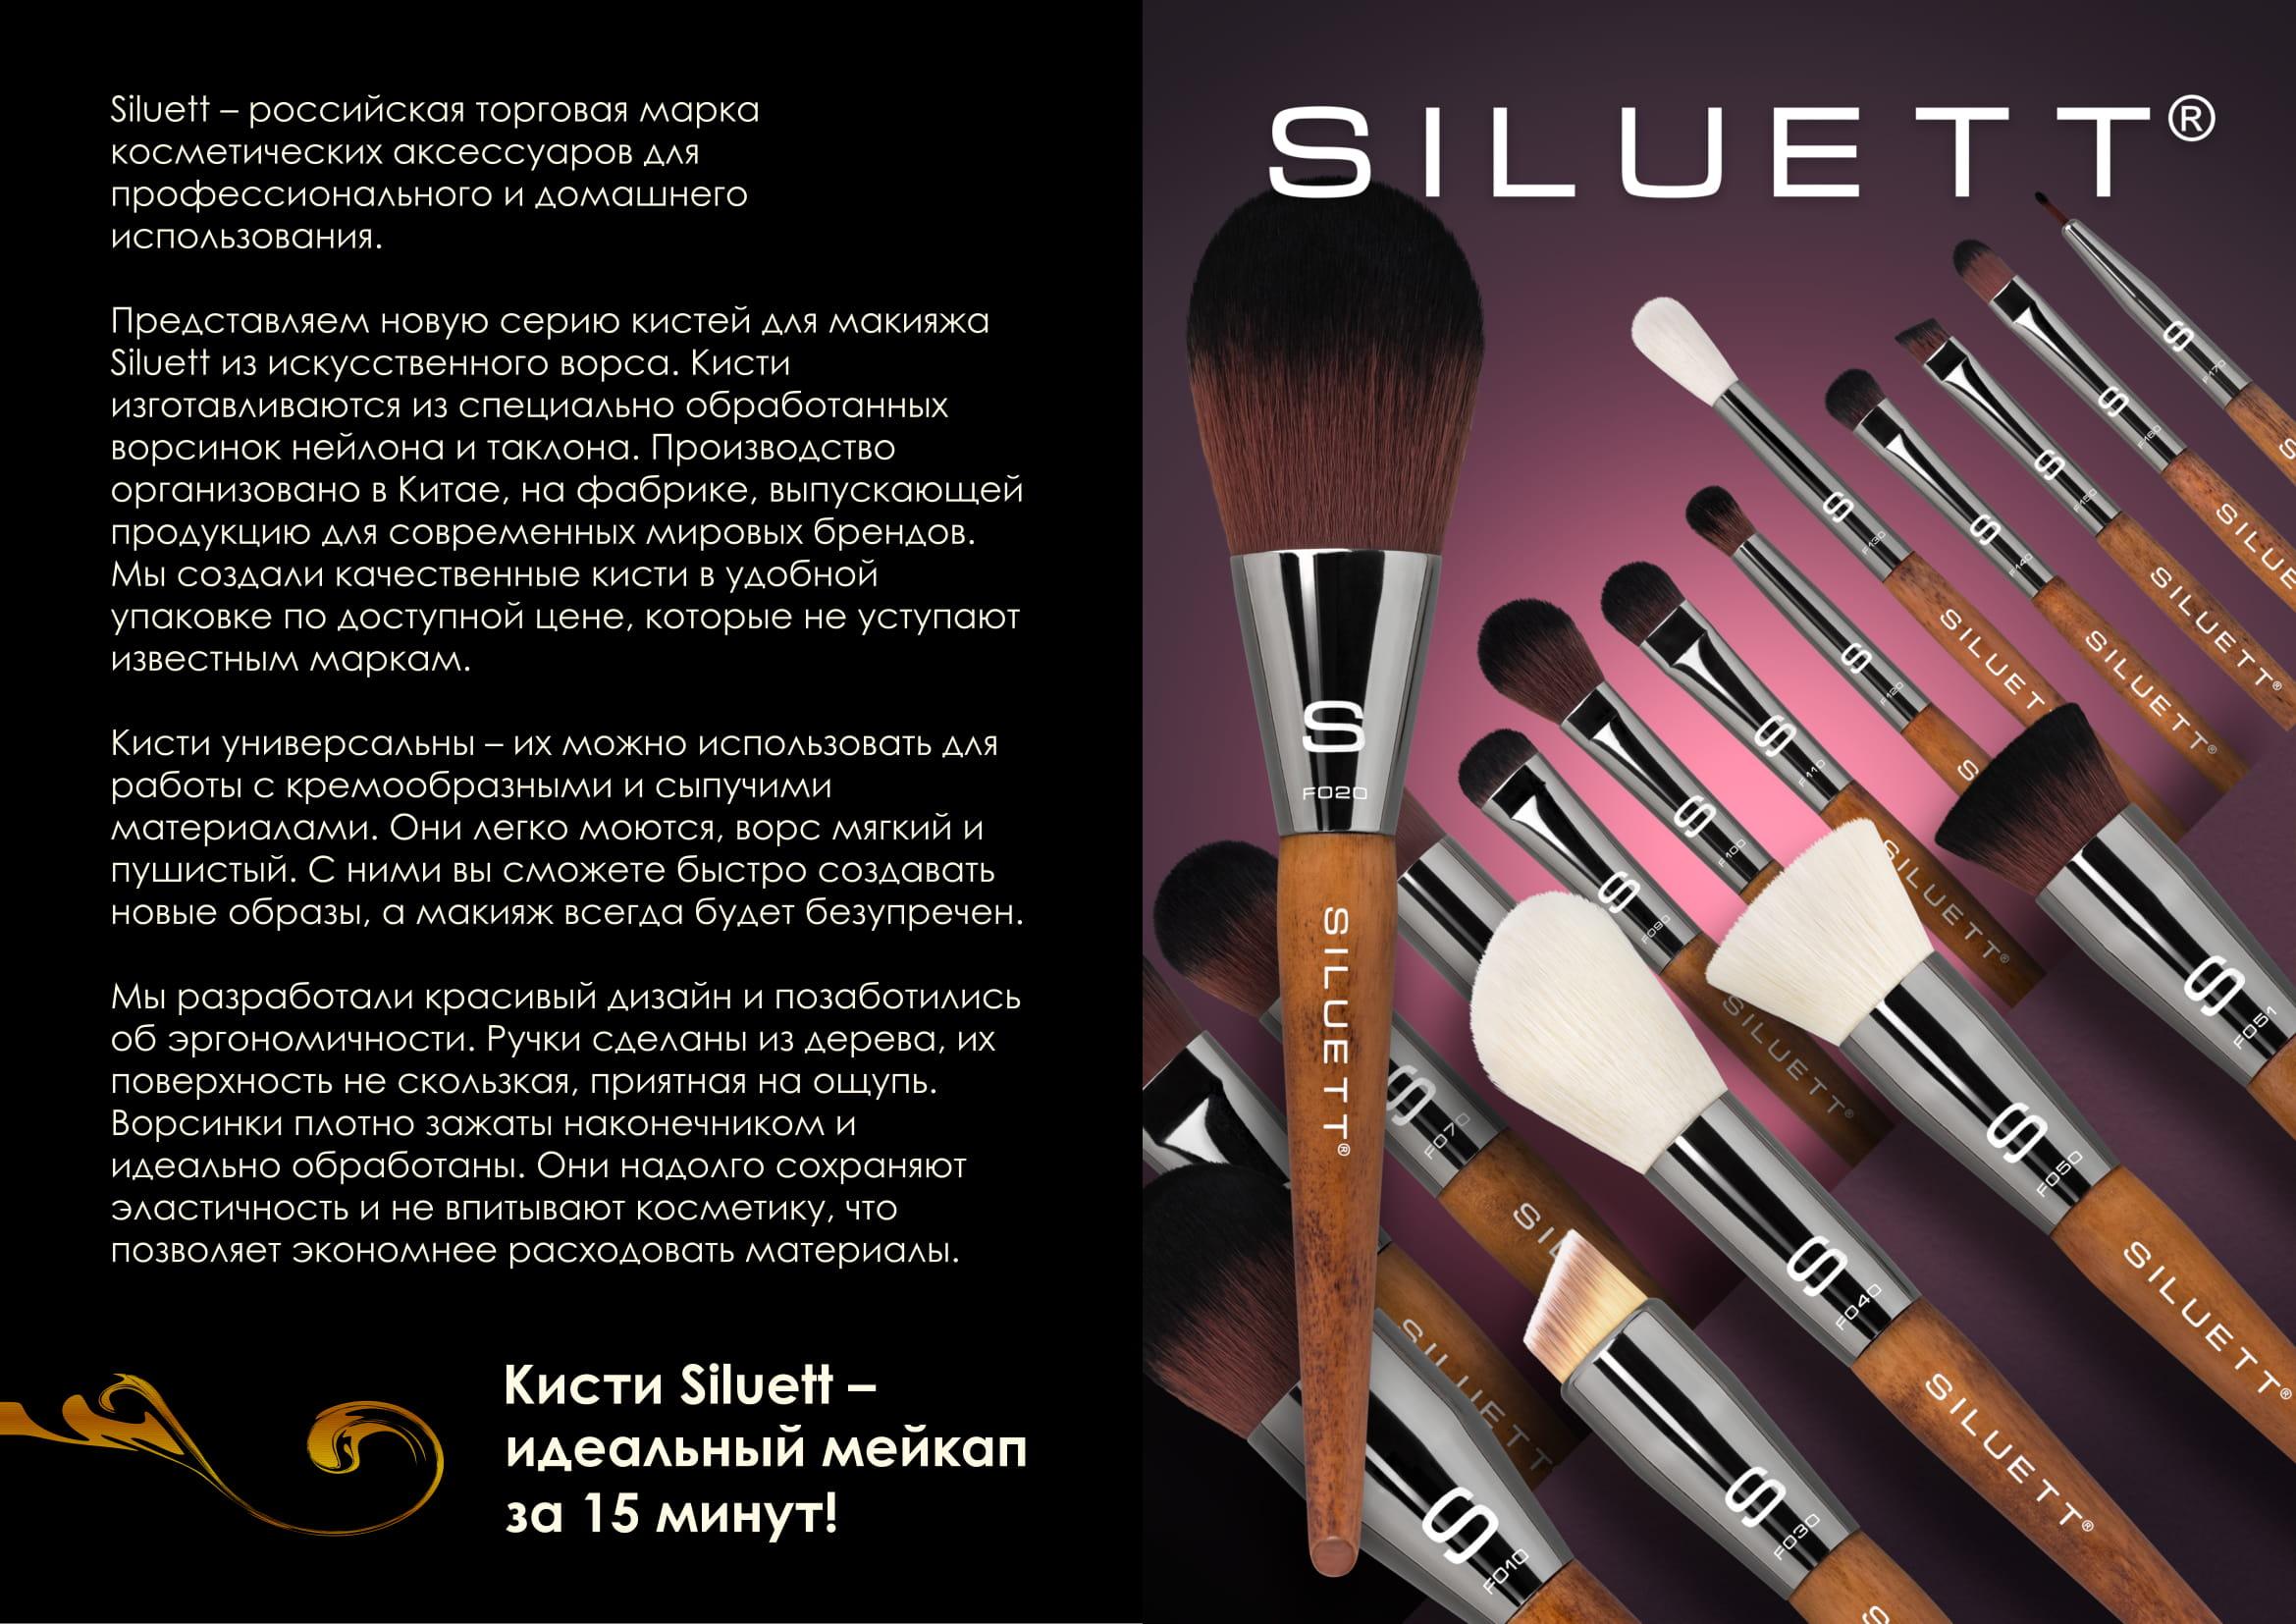 Презентация кисти Siluett-2.jpg